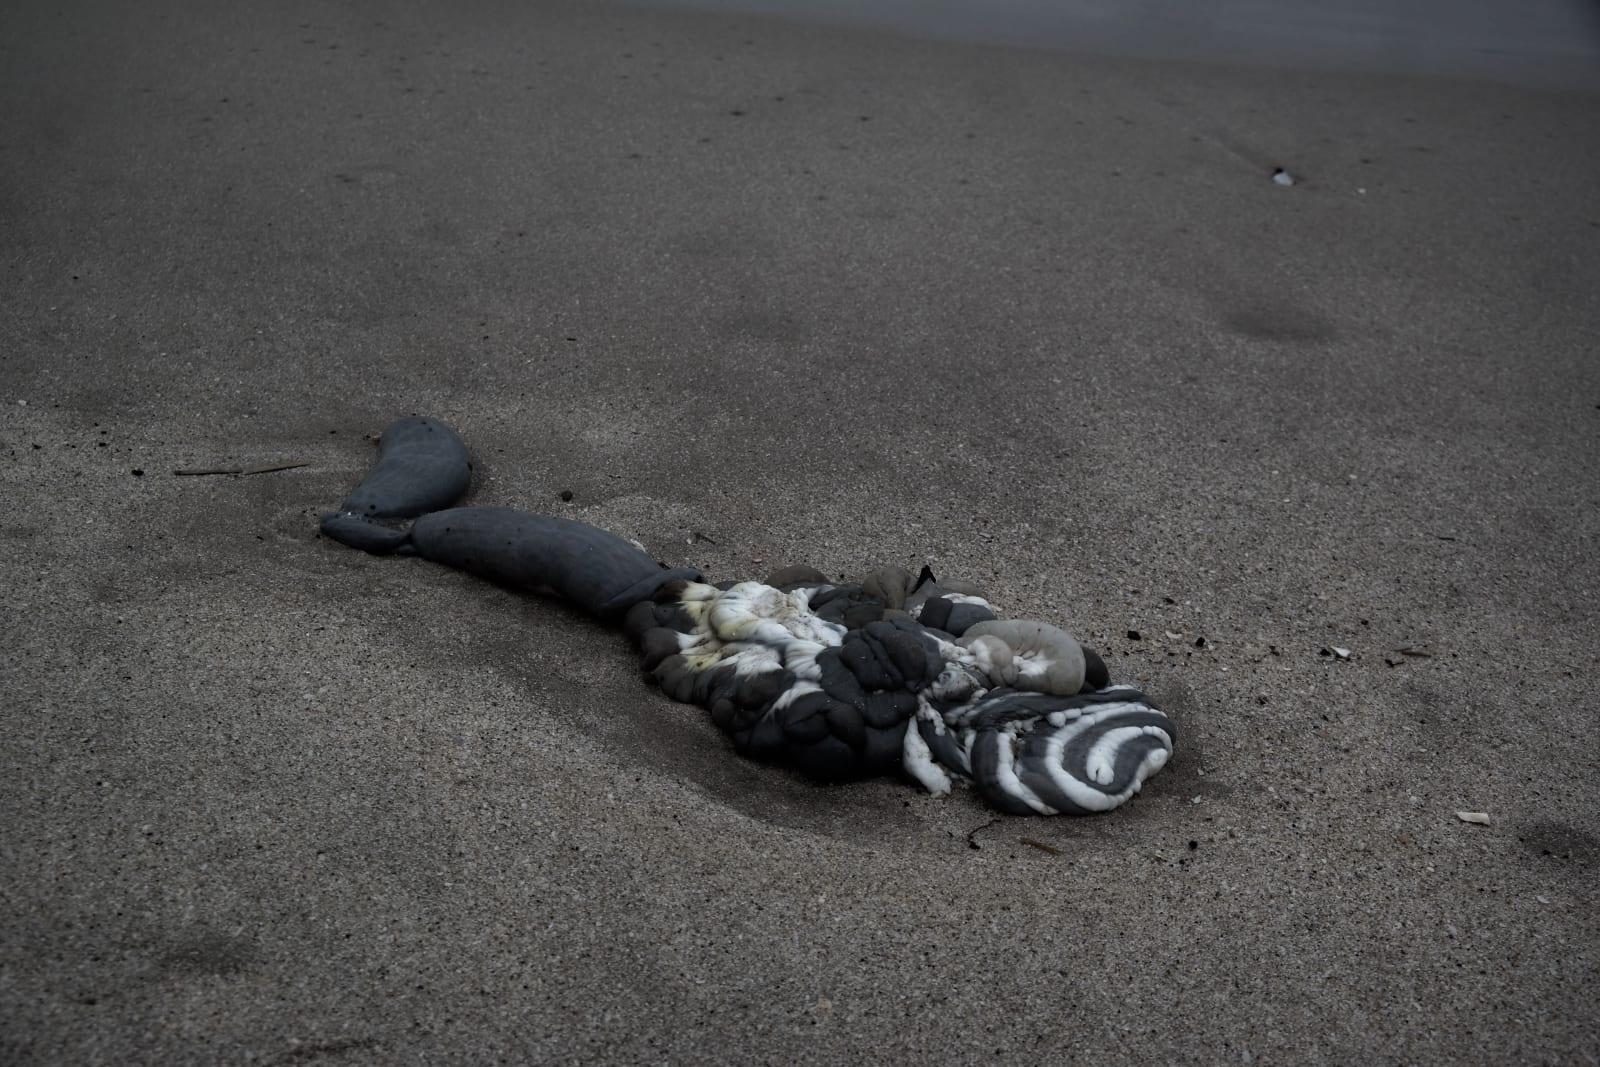 Latifah Iddriss treasures at shore iv - harakiri (inside earth) 42 x 27.67 cm 14.8 x 21 cm Digital print